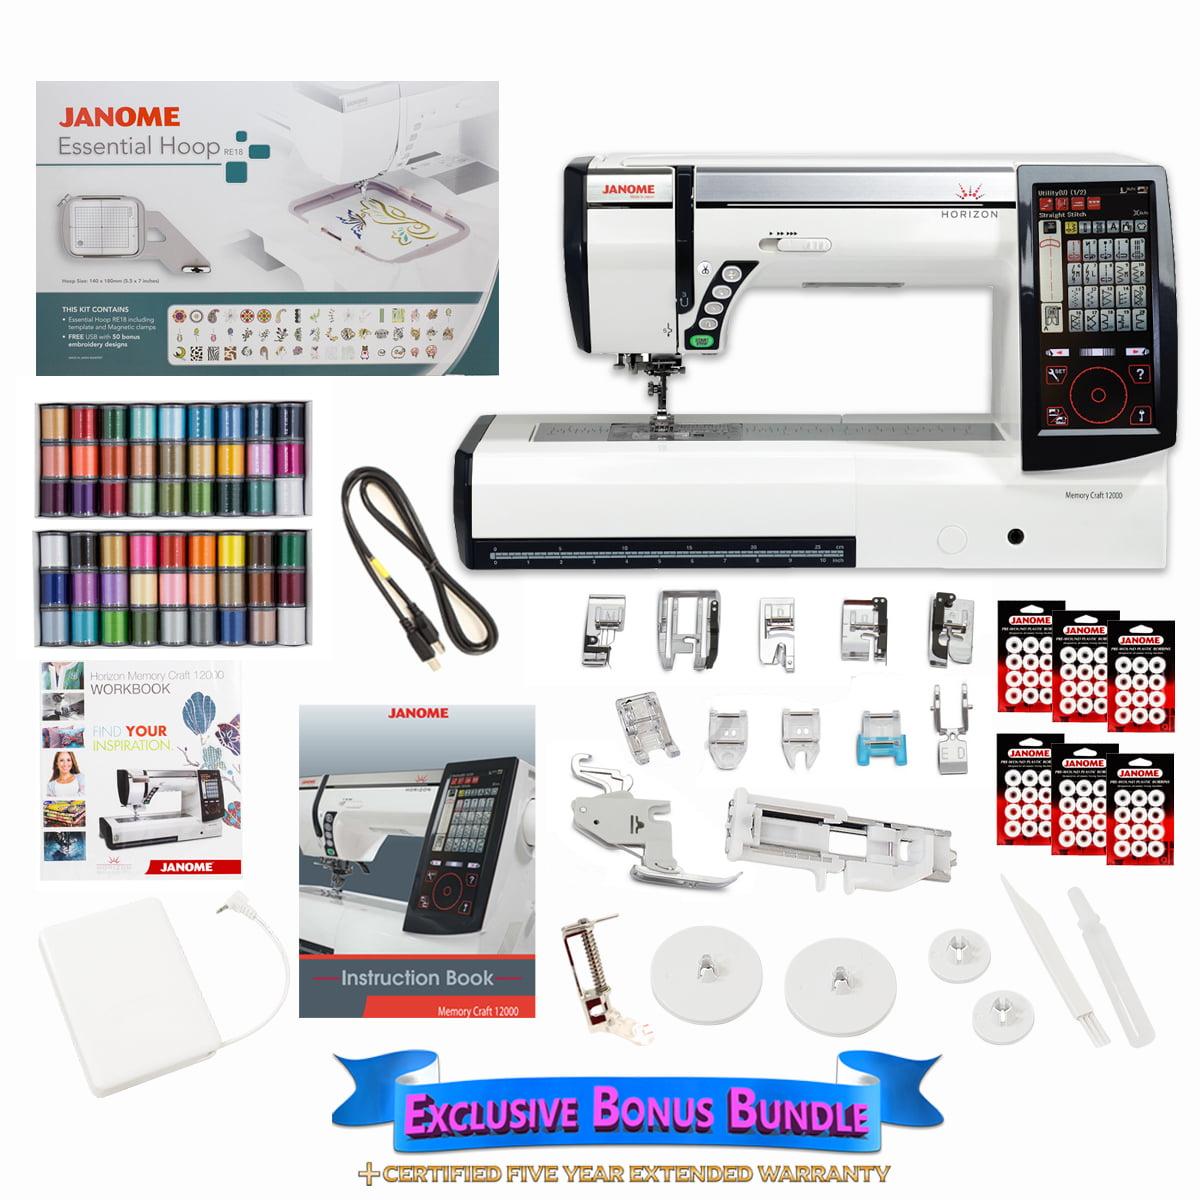 Janome memory craft 12000 - Janome Horizon Memory Craft 12000 Embroidery And Sewing Machine With Exclusive Bonus Bundle Walmart Com